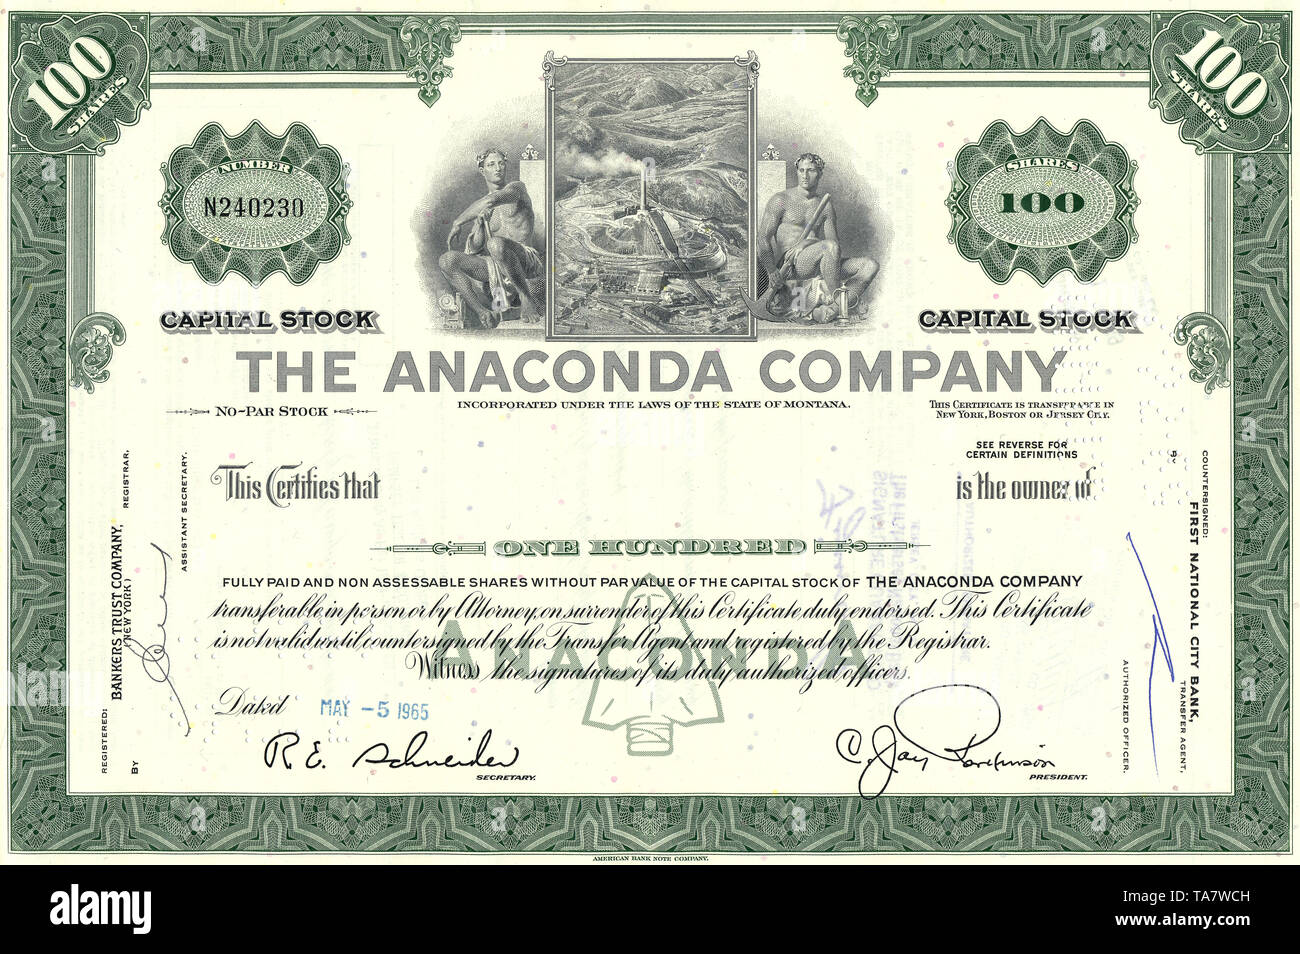 Historische Aktie, Kupferbergbau, The Anaconda Copper Mining Company, 1965, Montana, USA, Historical stock certificate - Stock Image